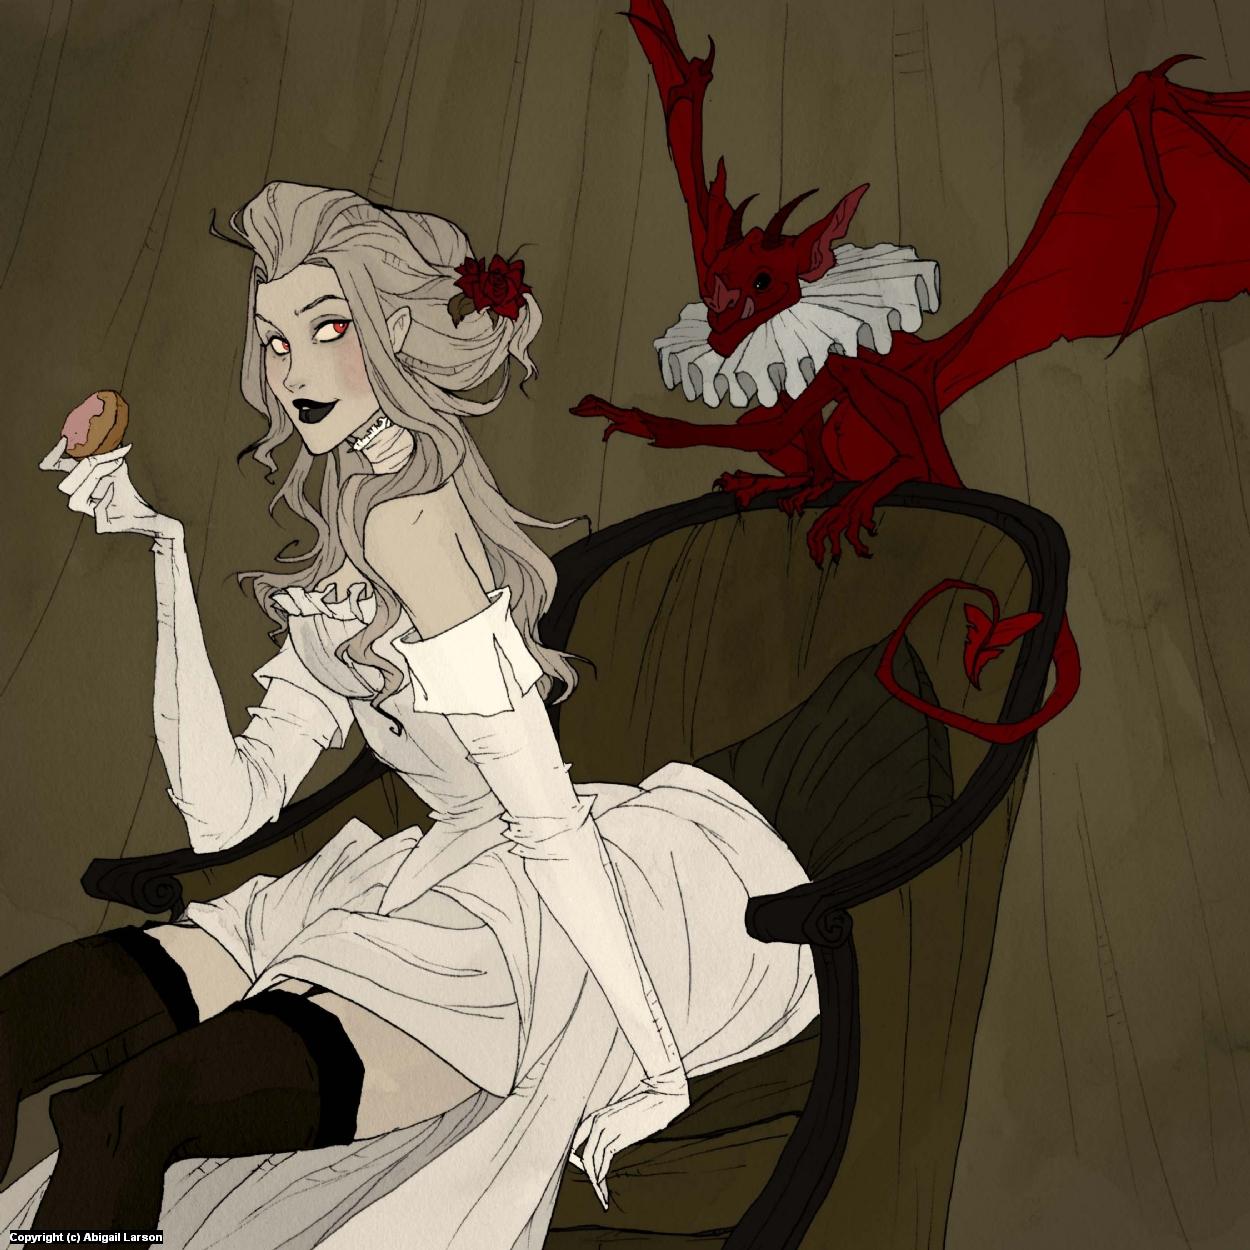 Little Demon Artwork by Abigail Larson